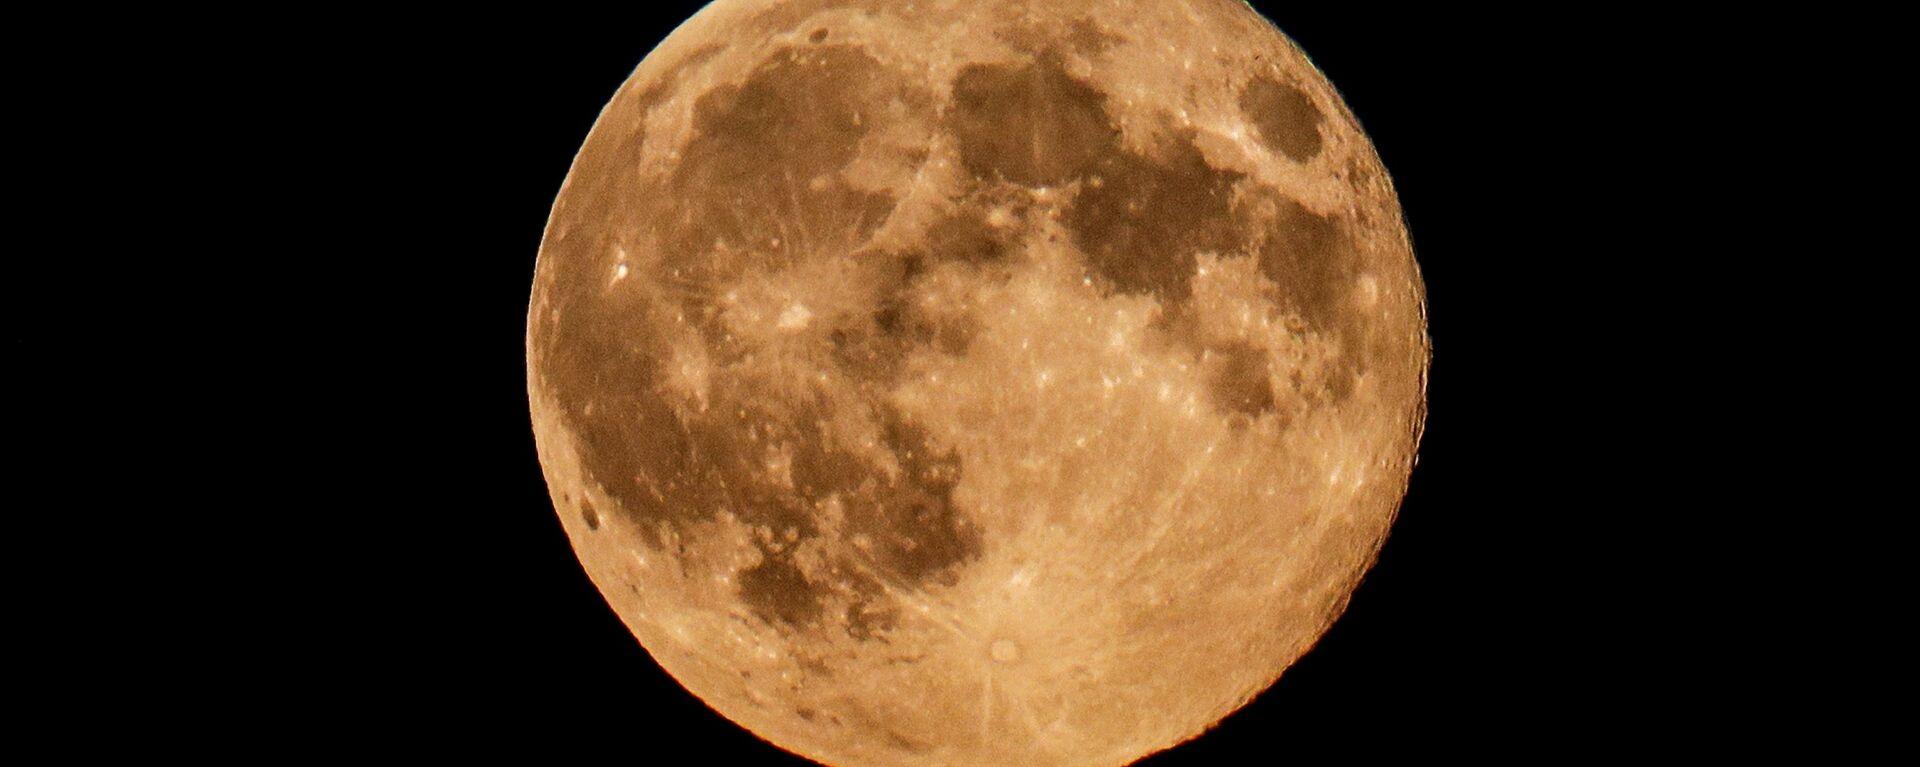 La Luna (imagen referencial) - Sputnik Mundo, 1920, 04.06.2021